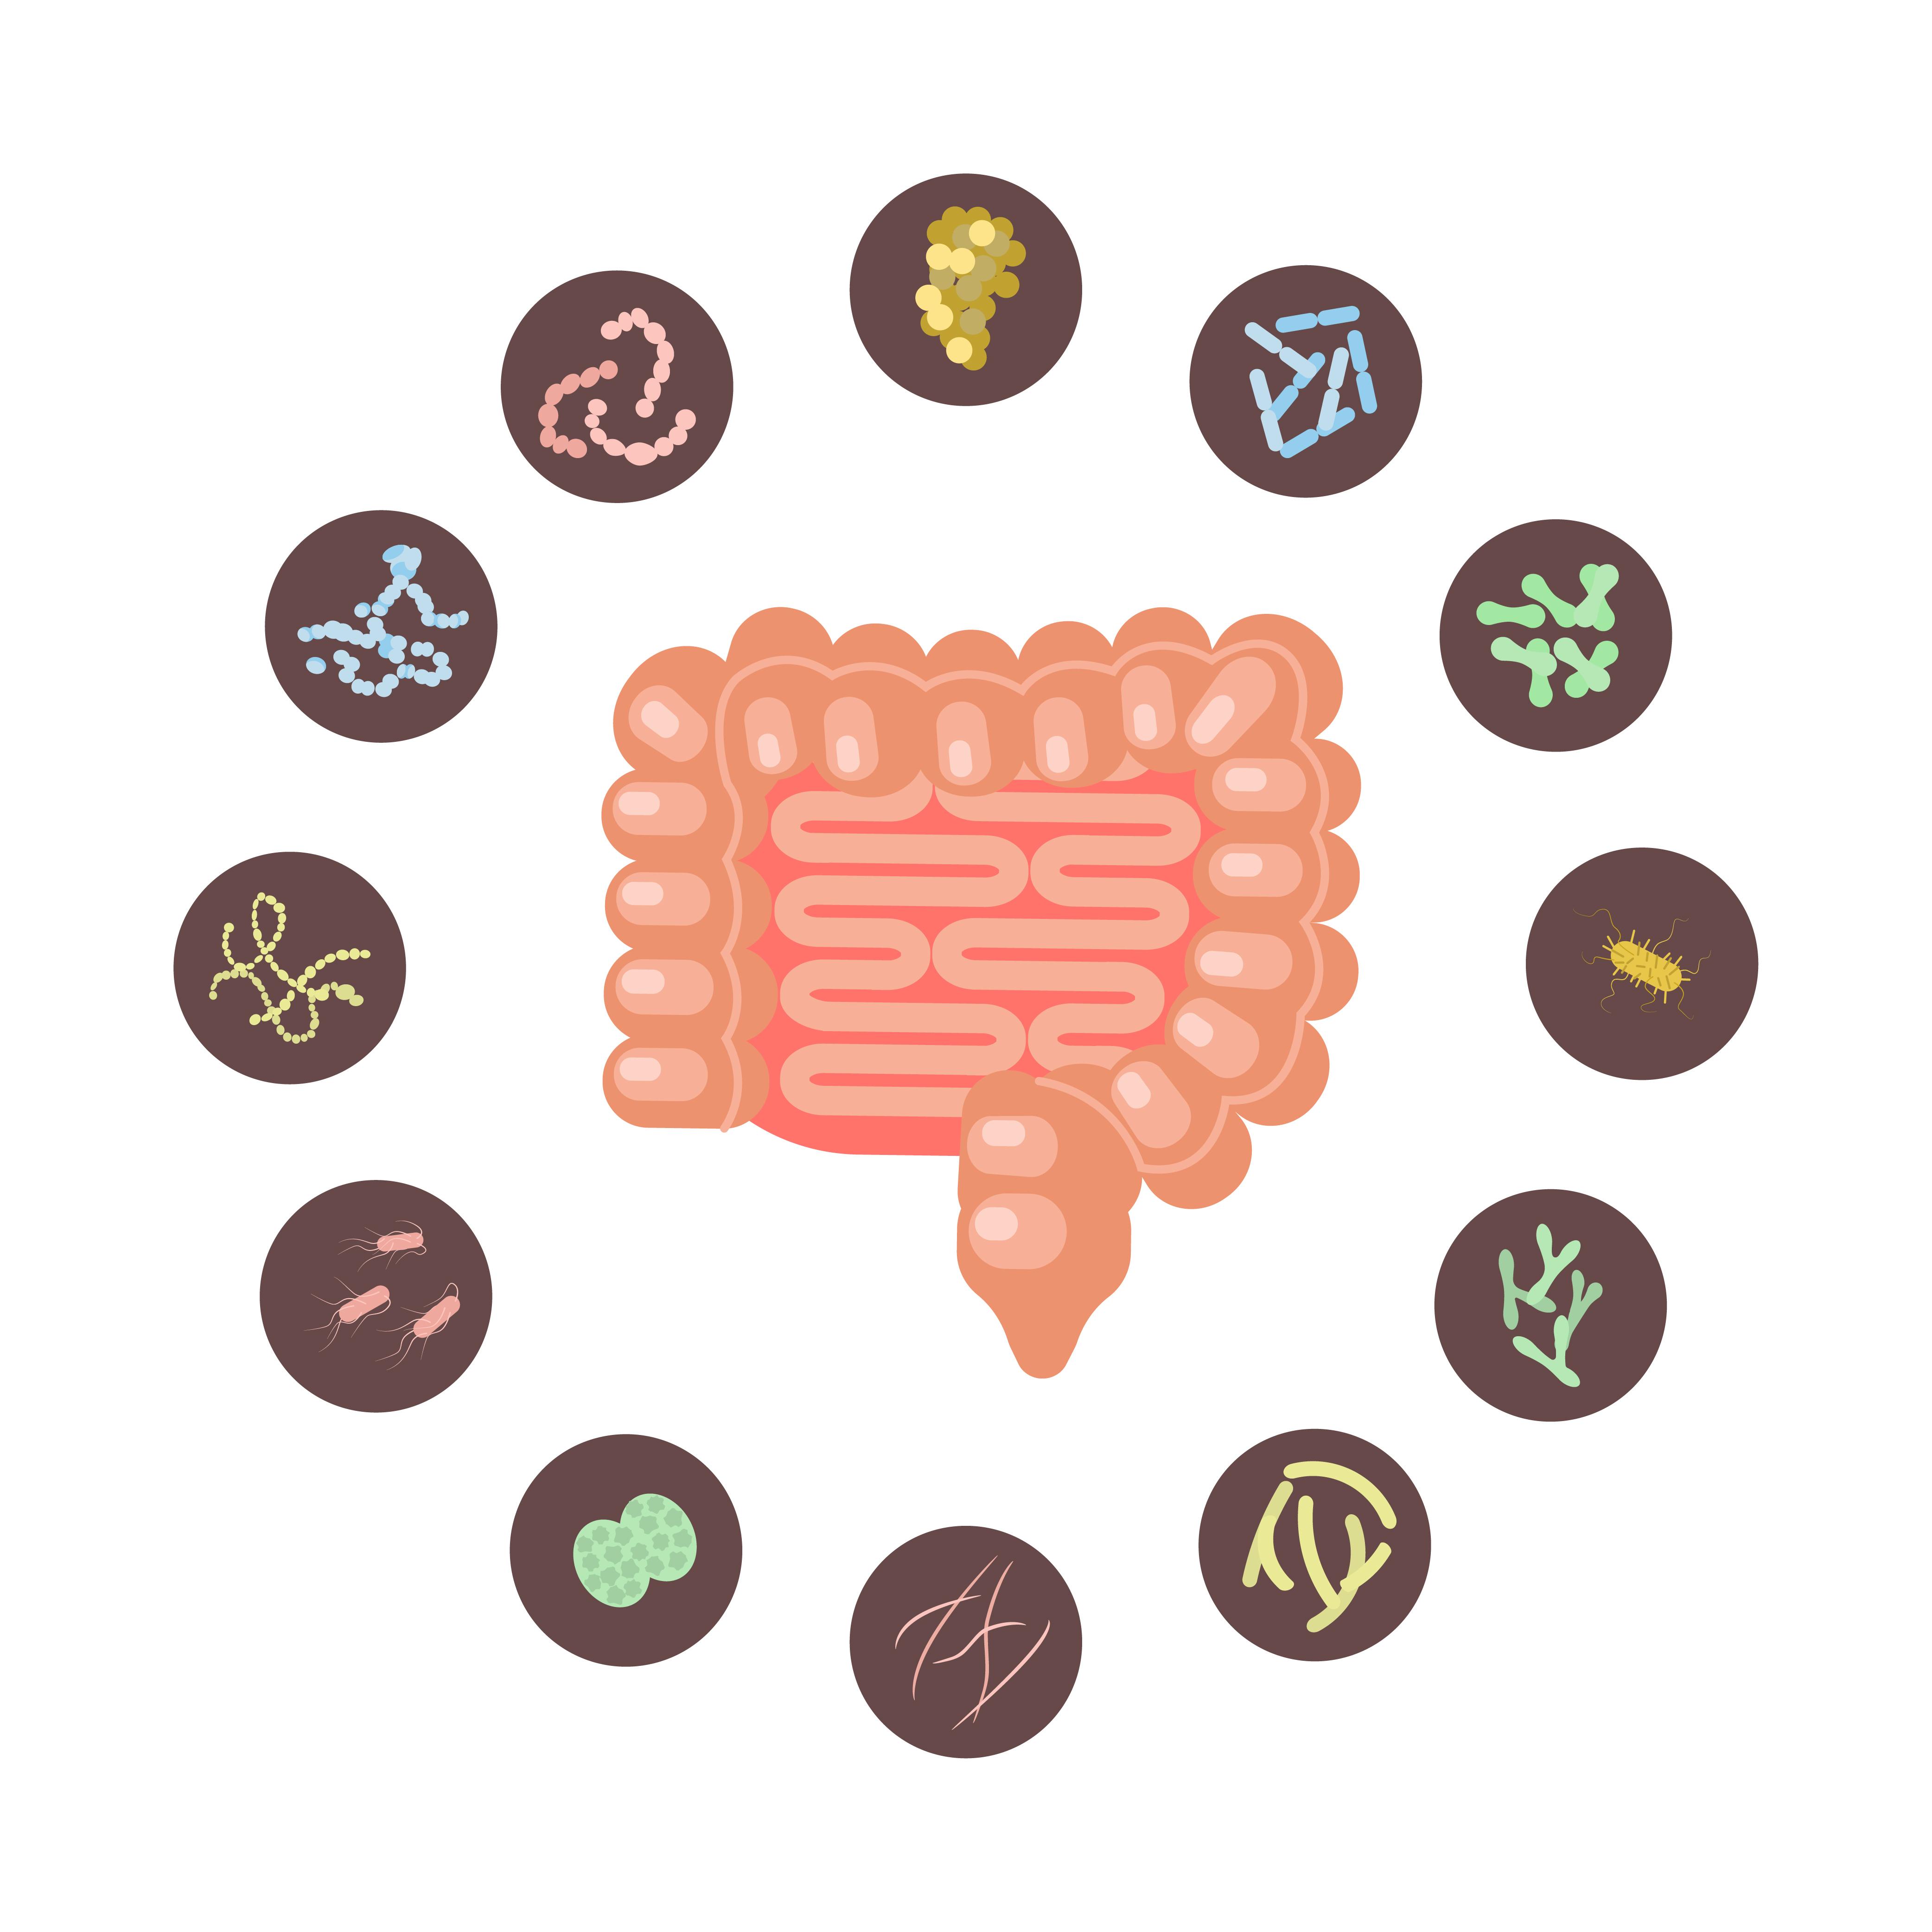 The Megasporebiotic Leaky Gut Study